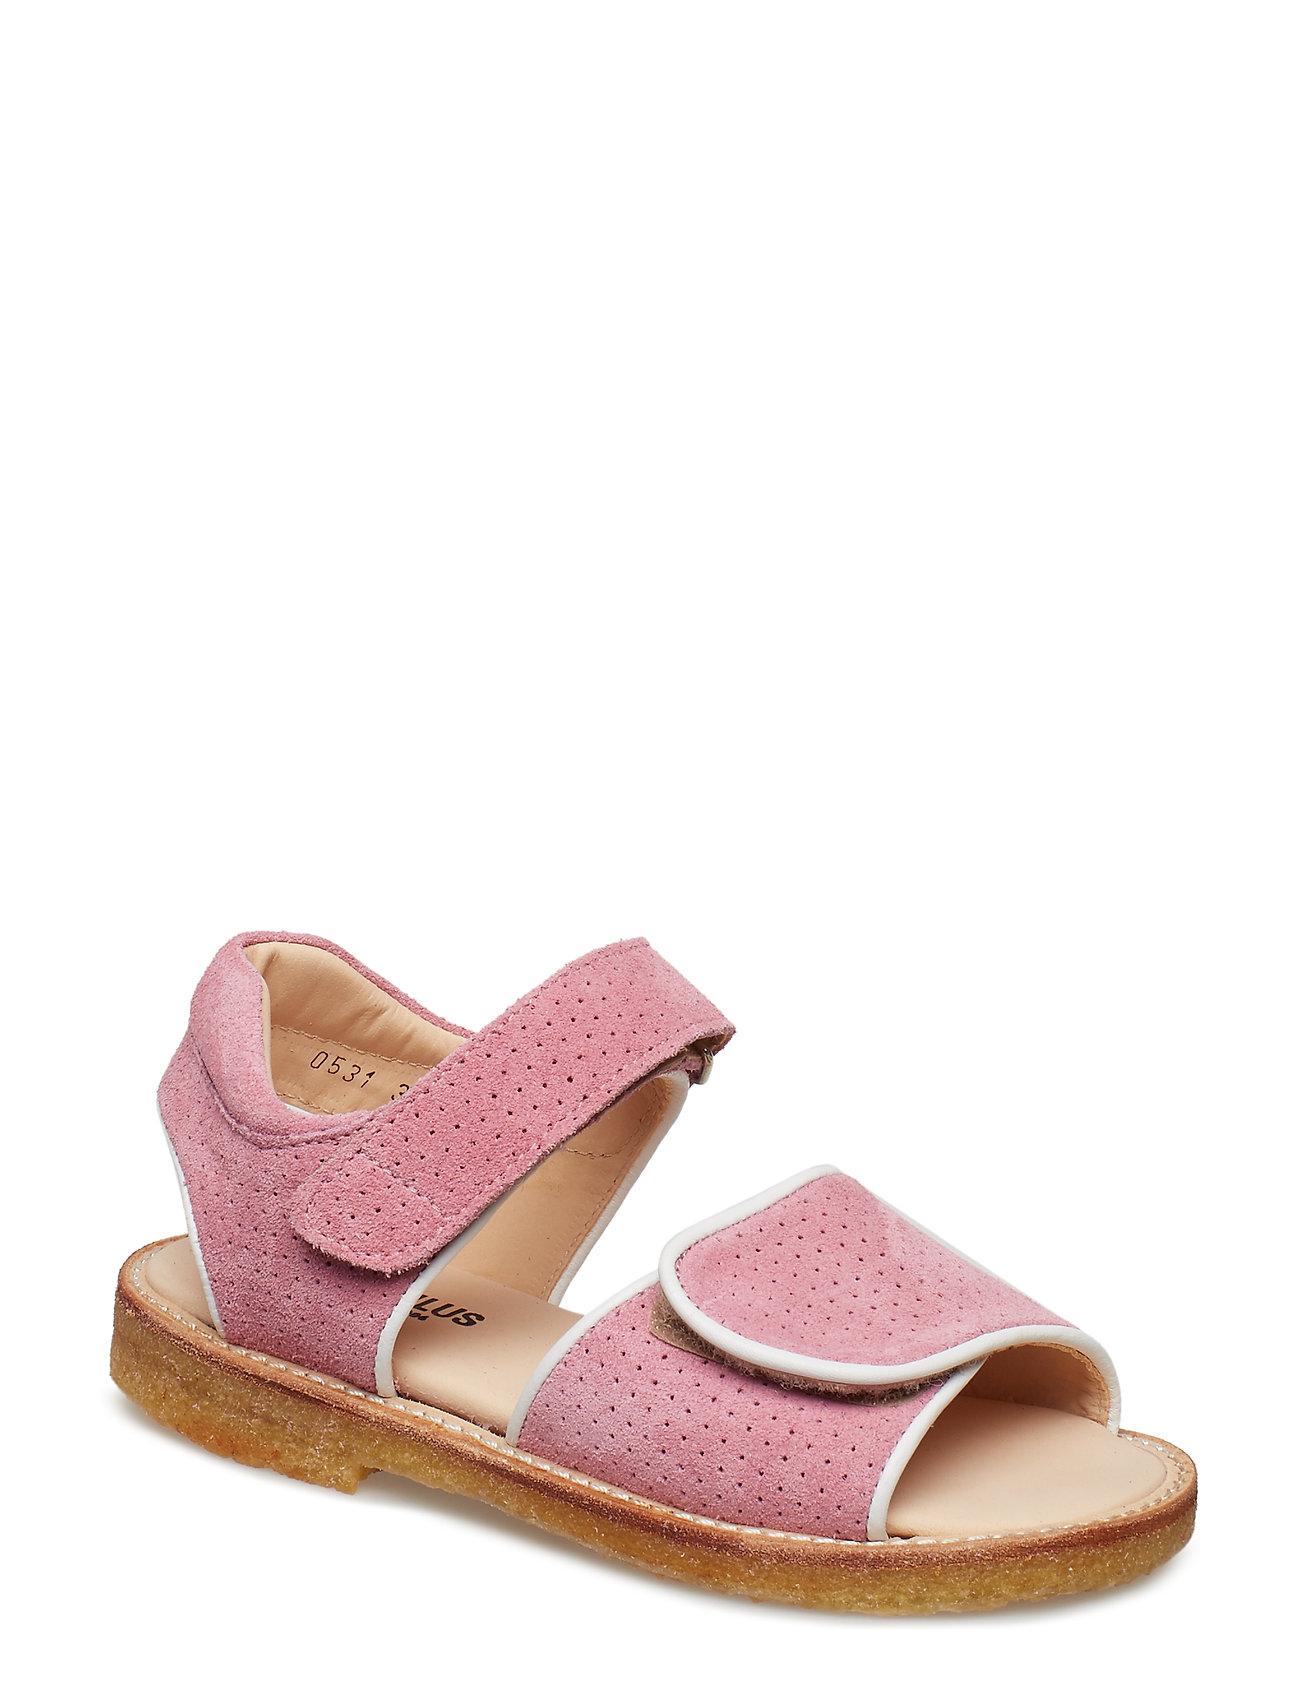 ANGULUS Sandals - flat - 1521/2204 WHITE/ROSE